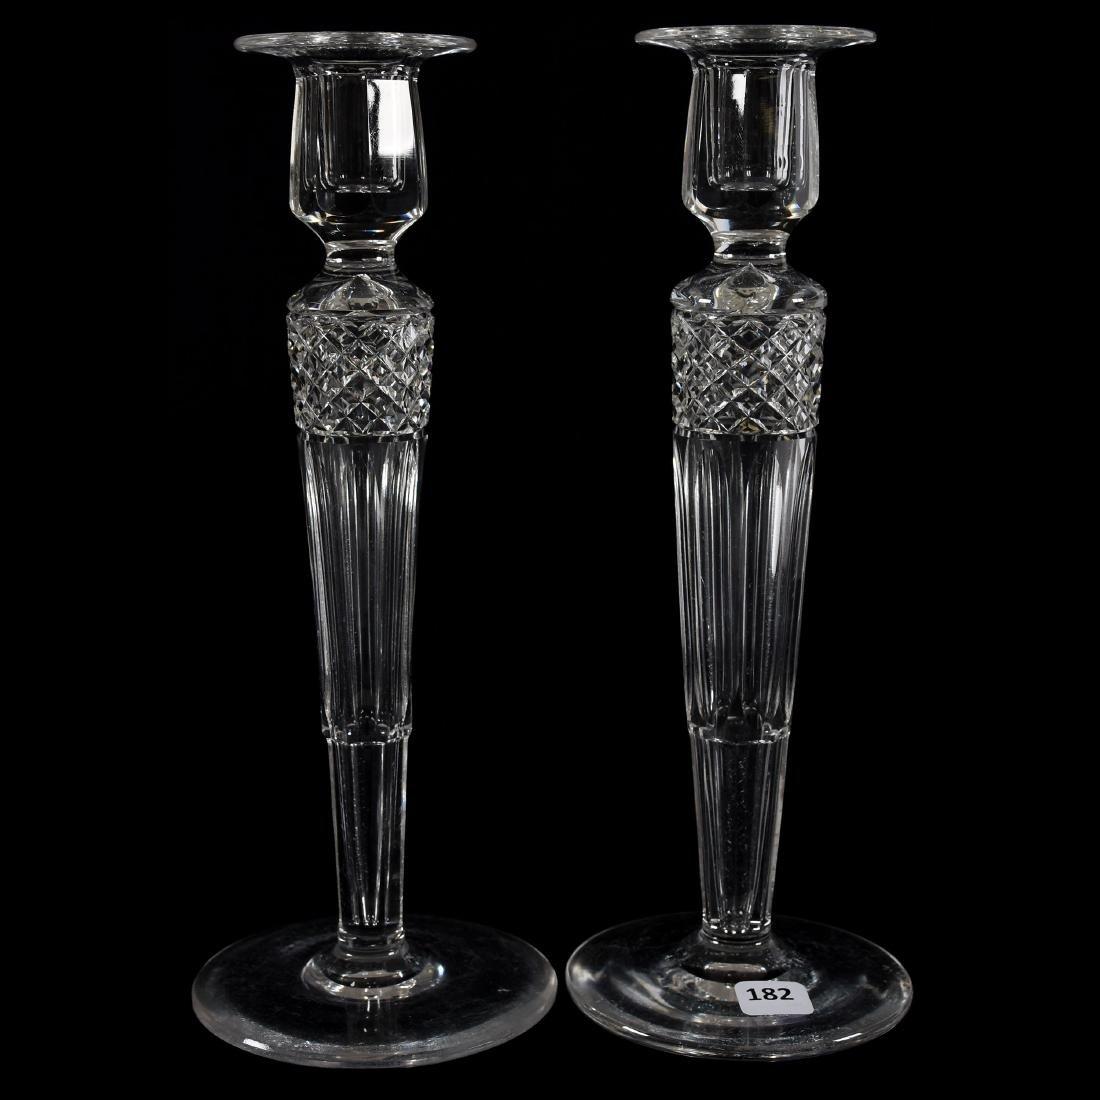 Pair Candlesticks, Signed Hawkes, Hollow Stem Diamond